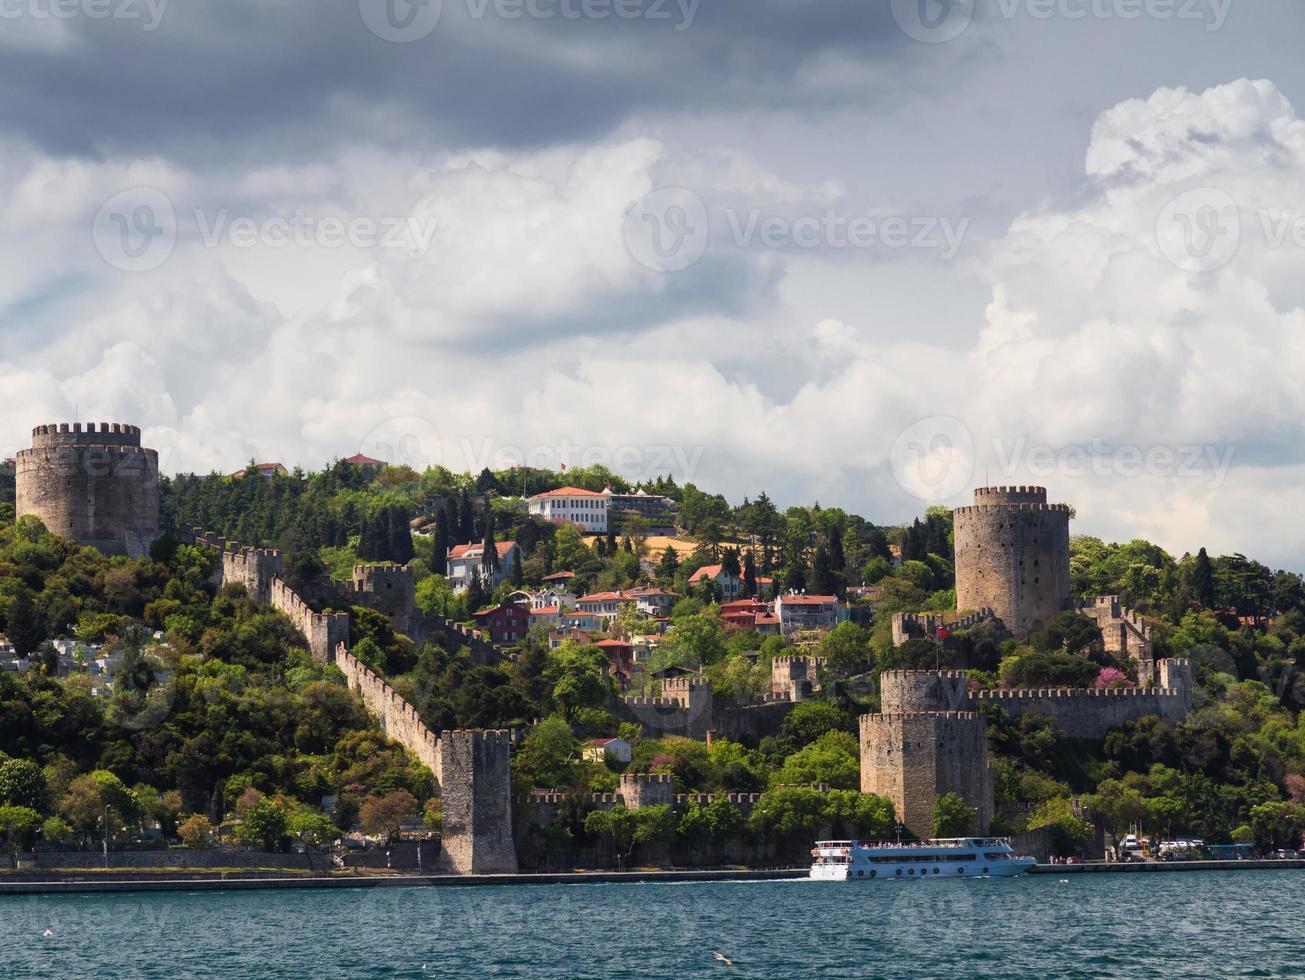 alte Festung rumelihisar istanbul, Truthahn foto